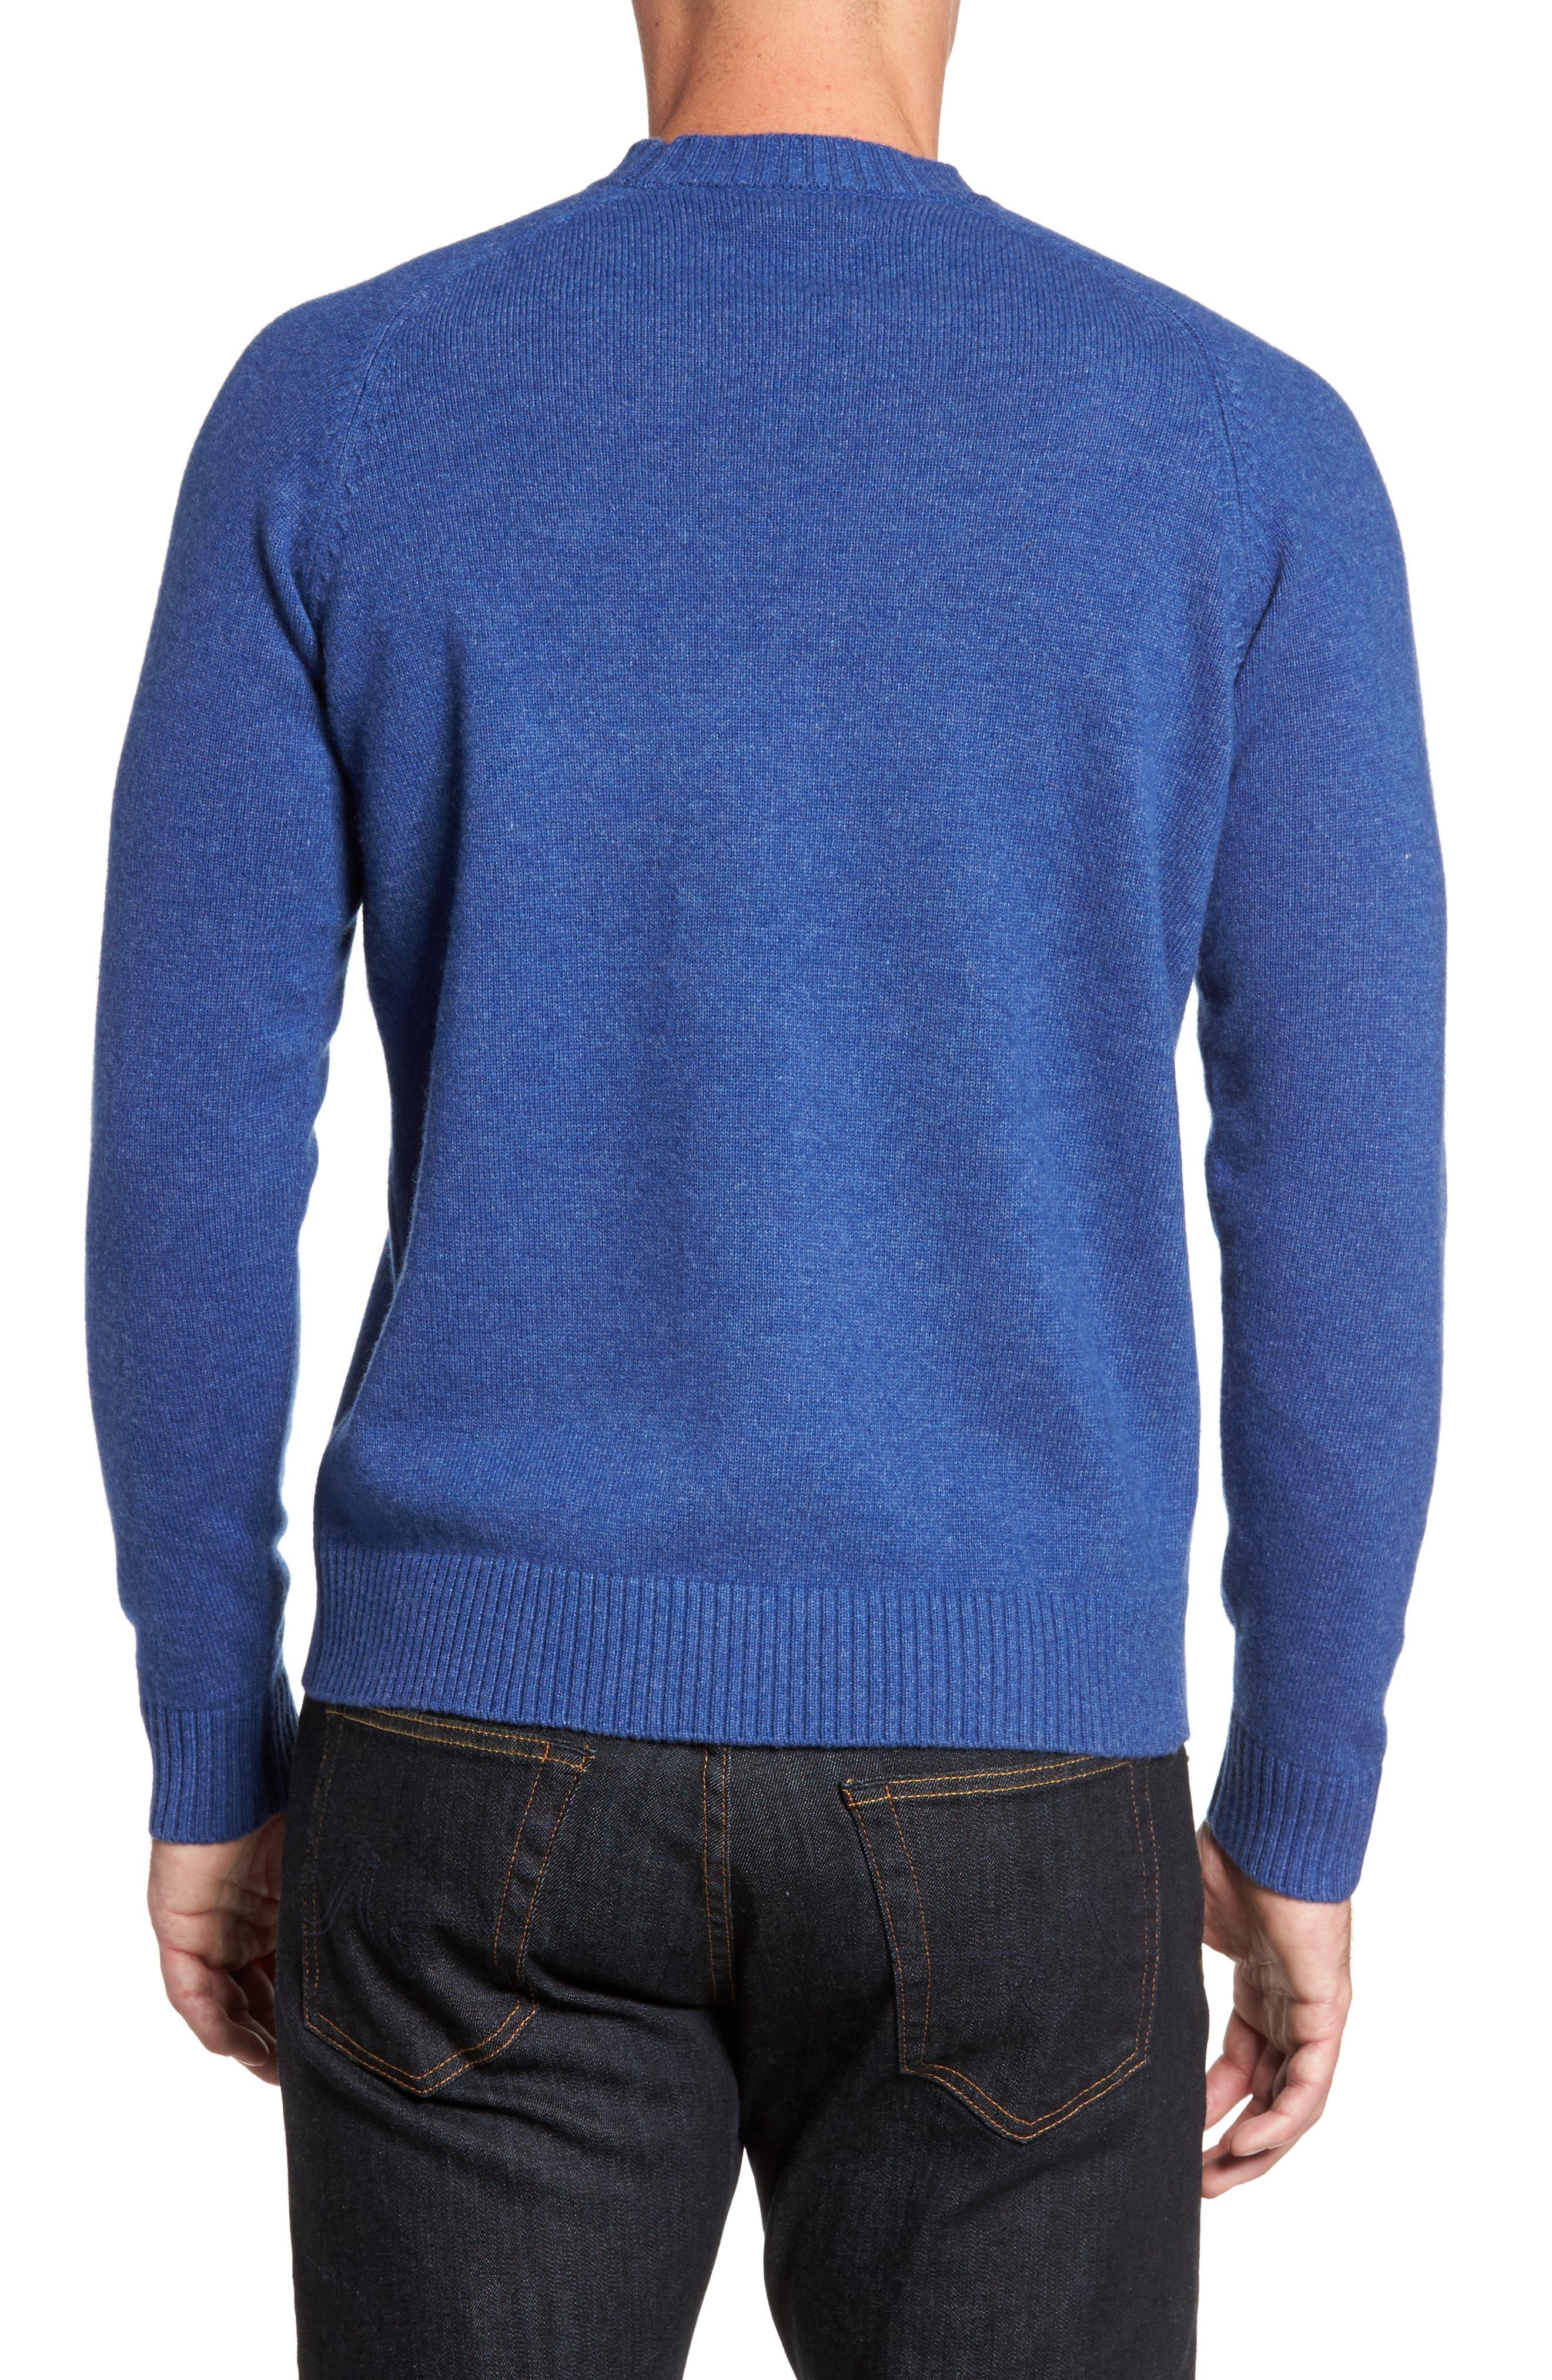 Crown Vintage Crewneck Sweatshirt,                             Alternate thumbnail 4, color,